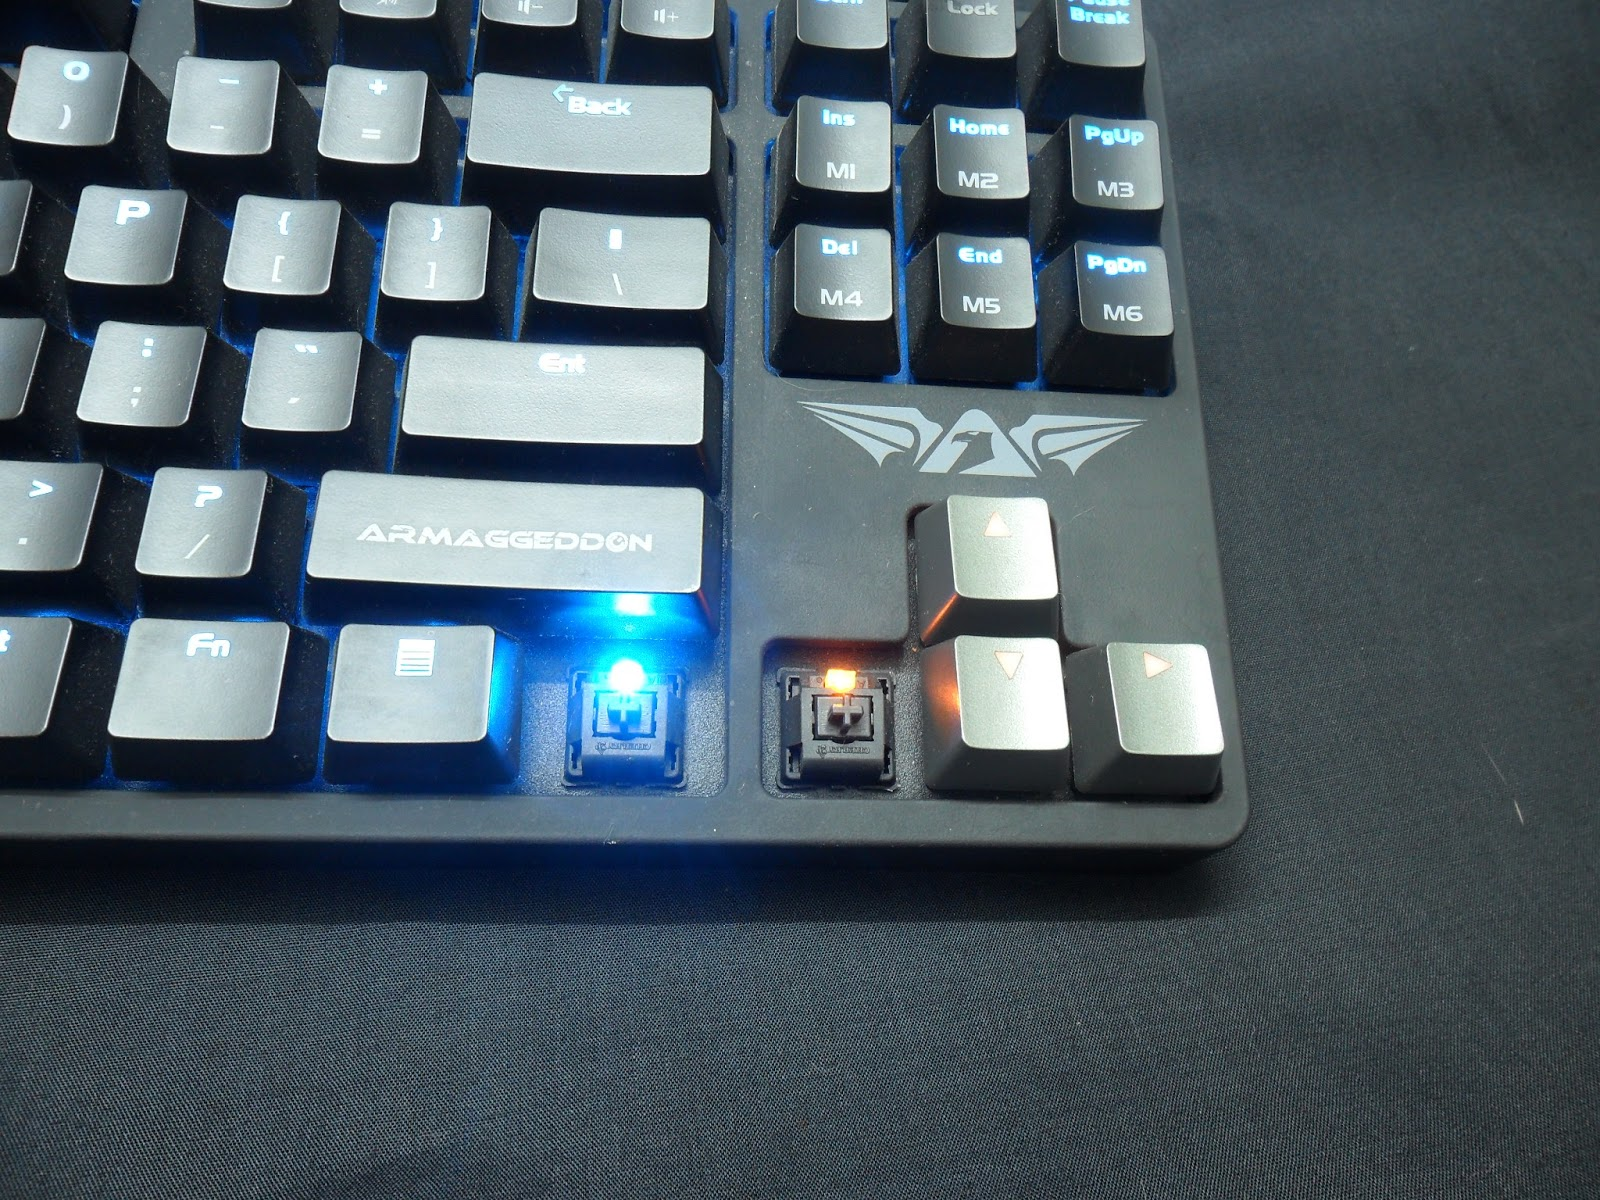 Unboxing & Review: Armaggeddon Black Hornet MKA-3 Mechanical Gaming Keyboard 13